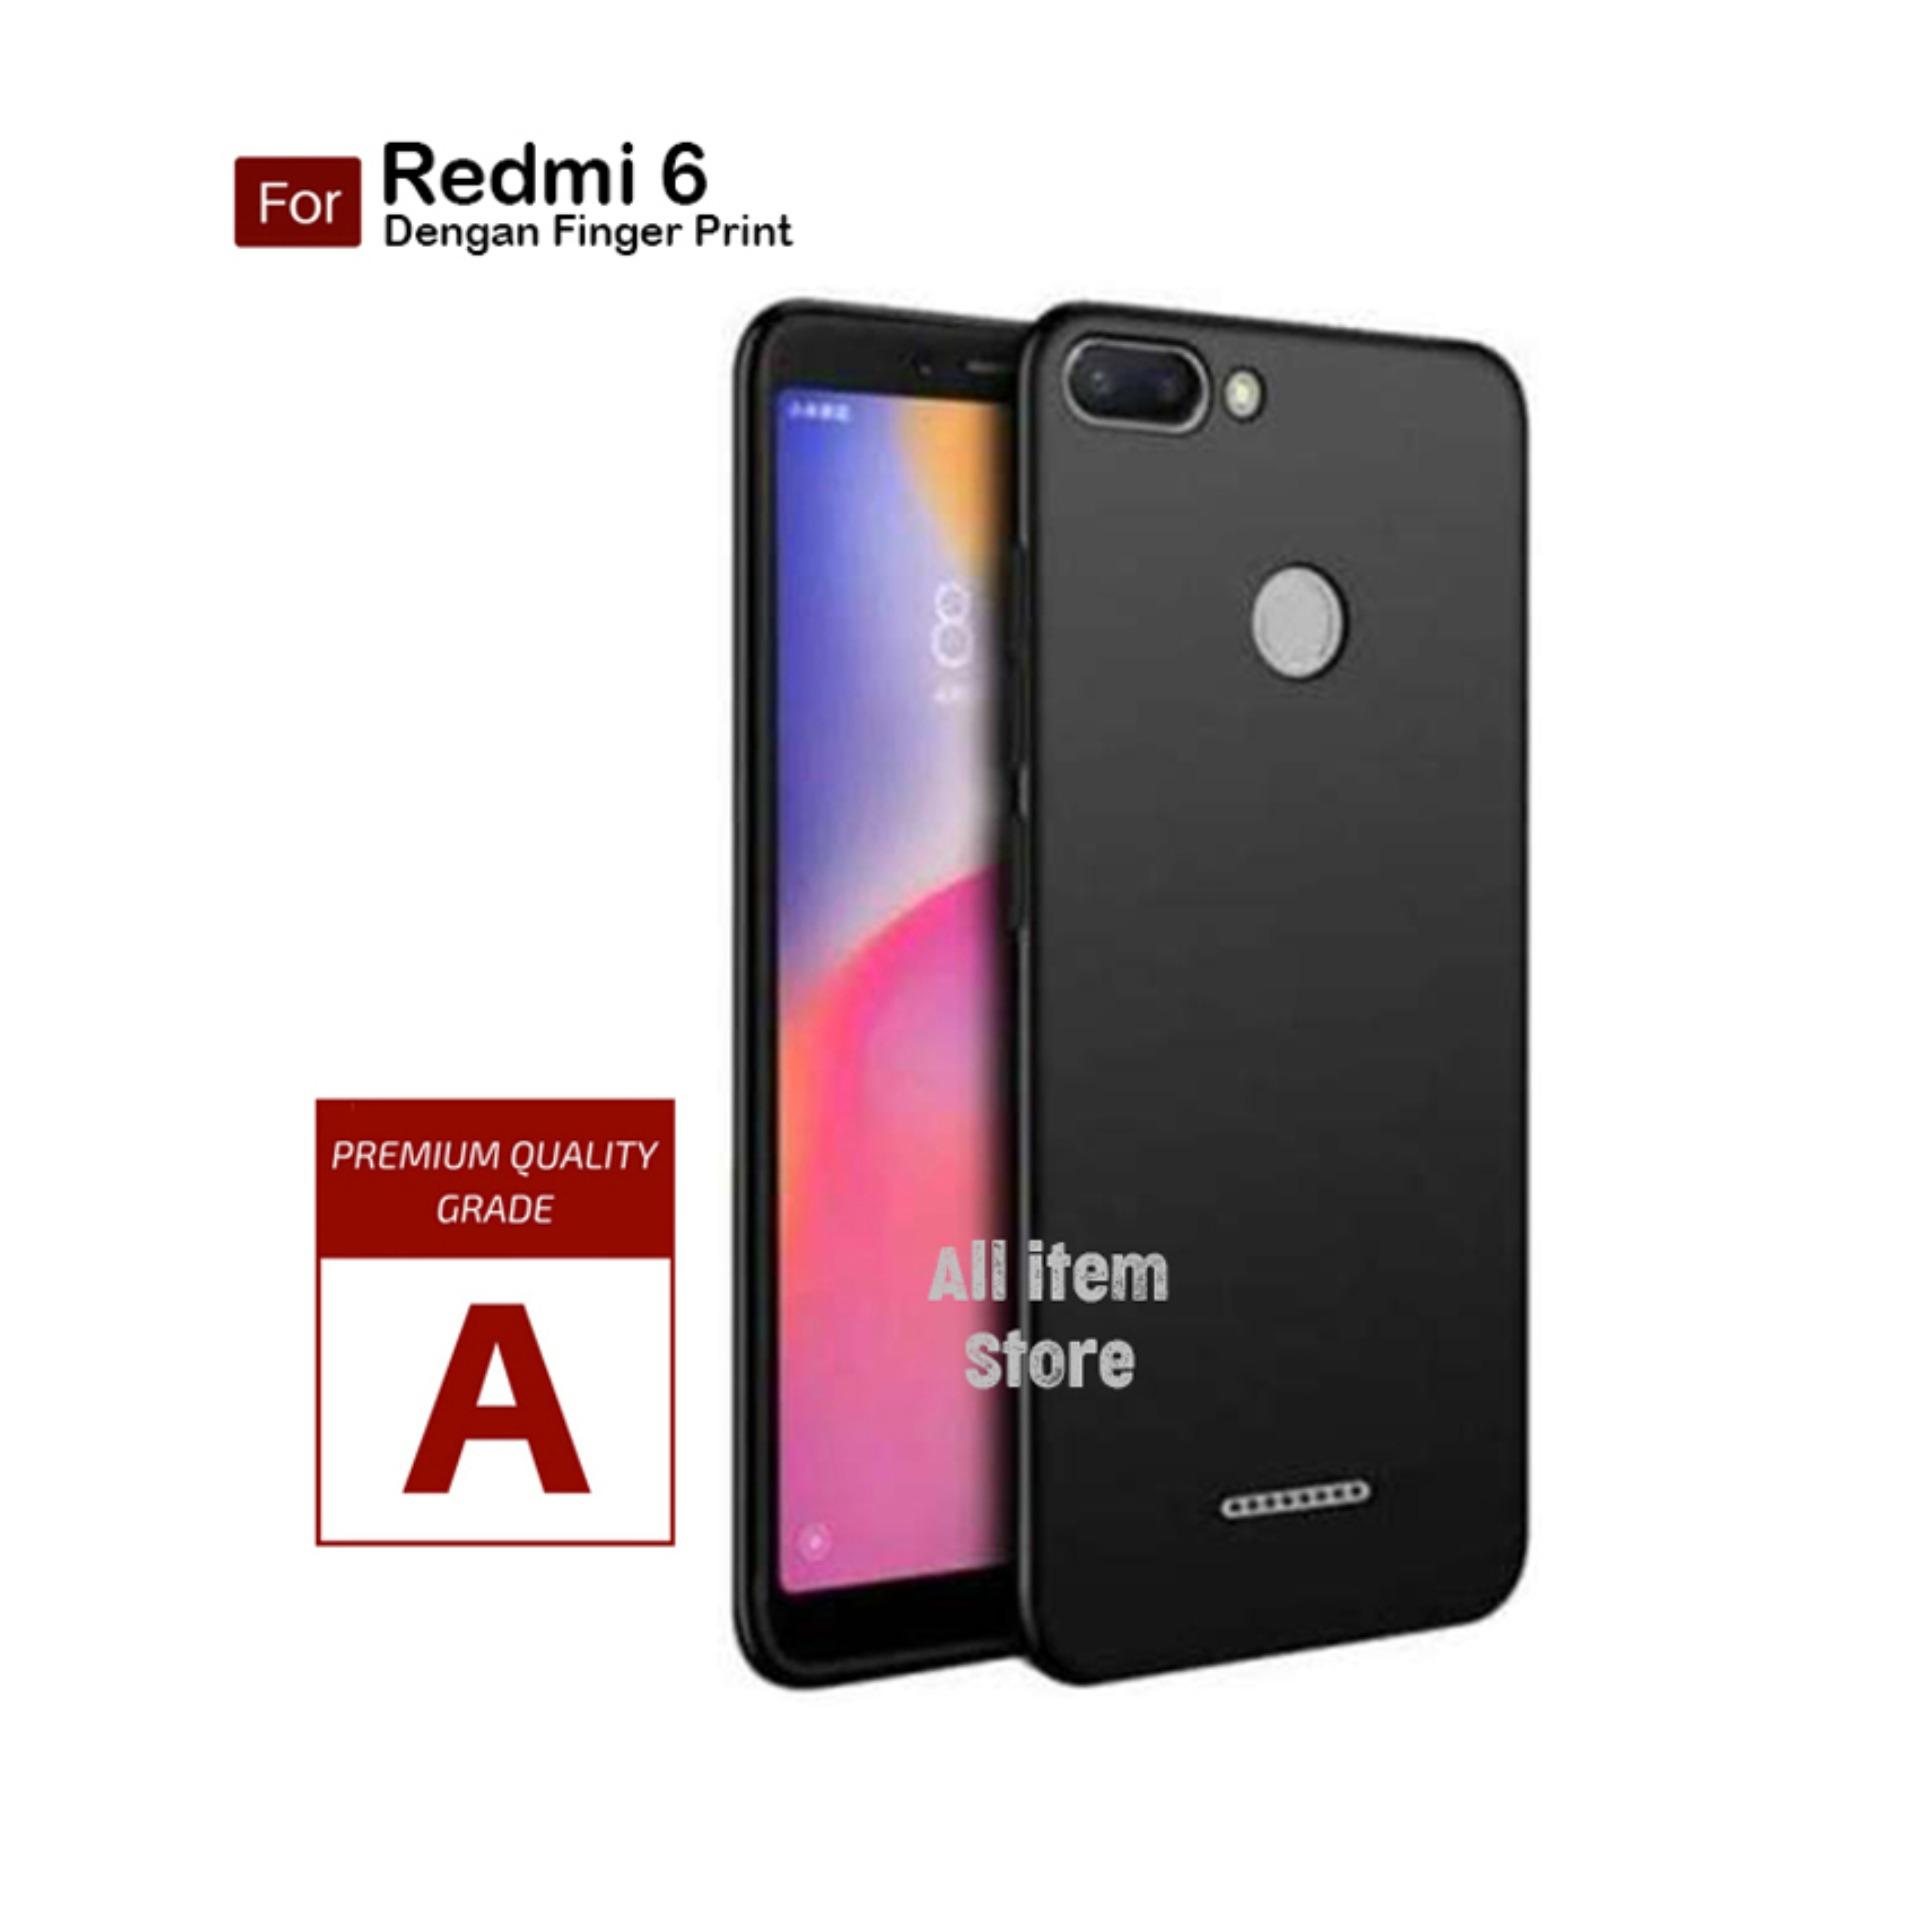 Case Slim Black Matte Xiaomi Redmi 6 Baby Skin Softcase Ultra Thin Jelly Silikon Babyskin - Hitam